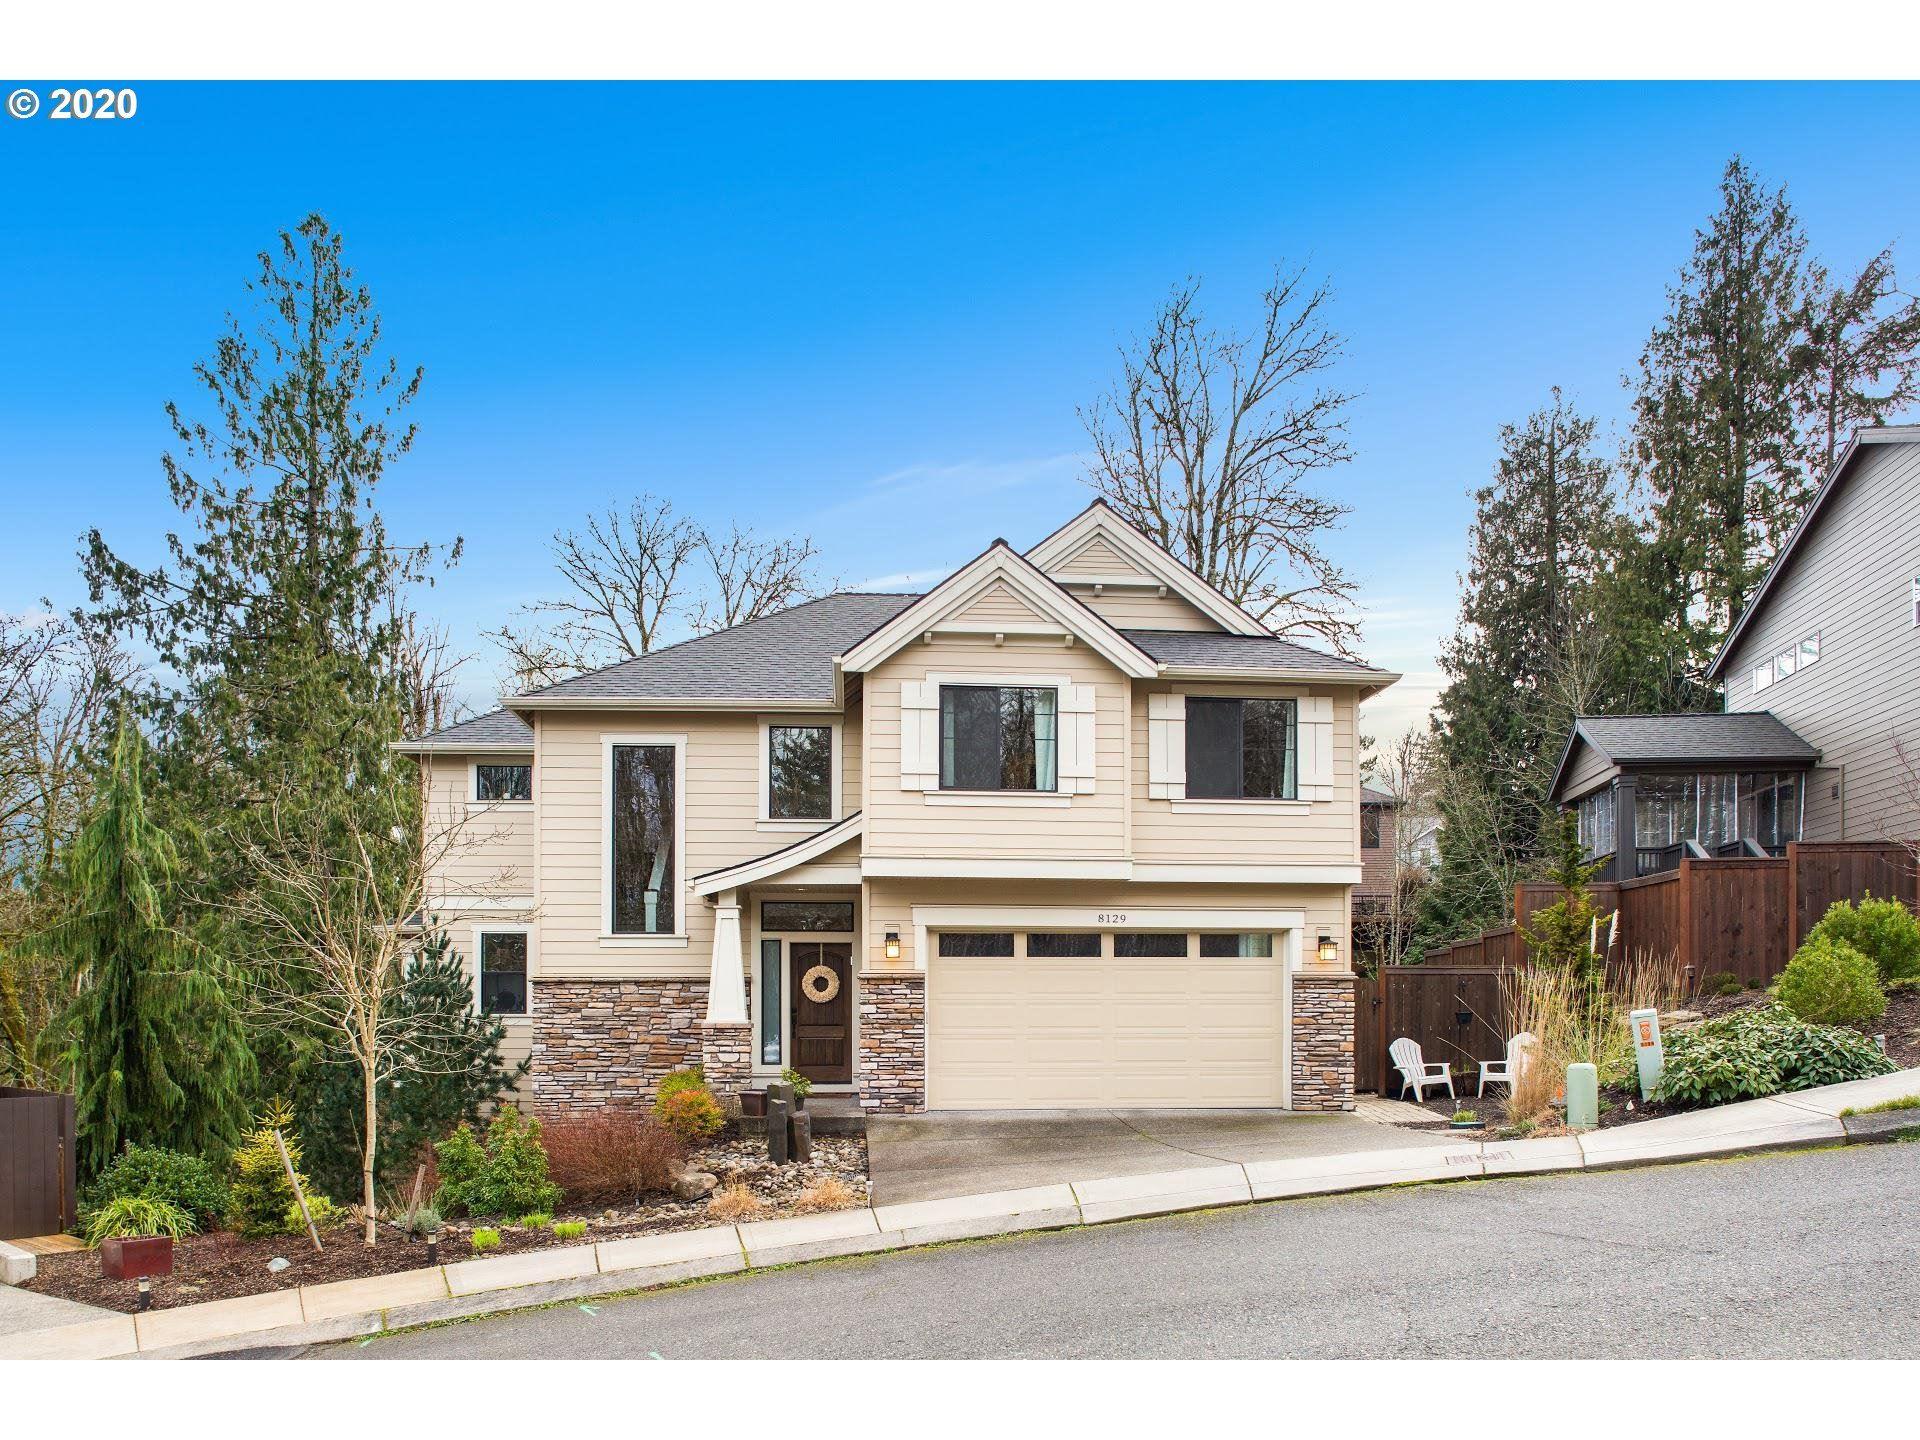 8129 SE 145TH CT, Portland, OR 97236 - MLS#: 20313272